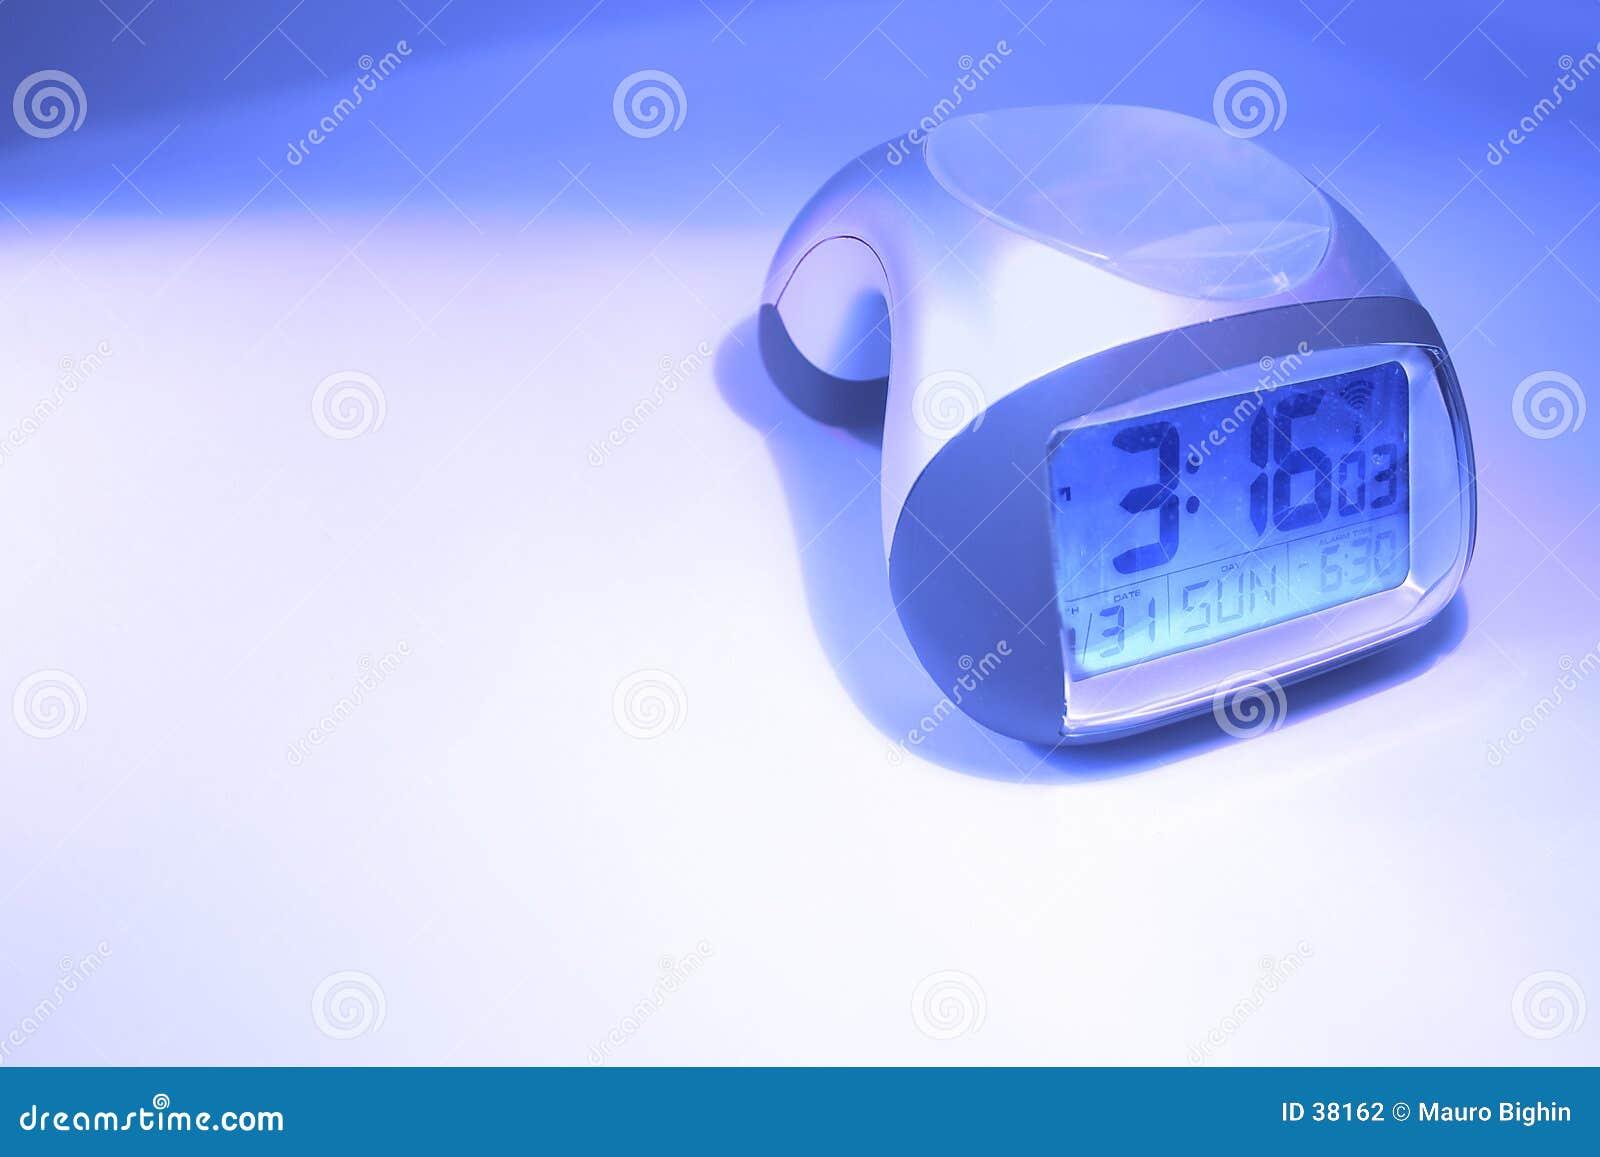 Wake up - alarm clock